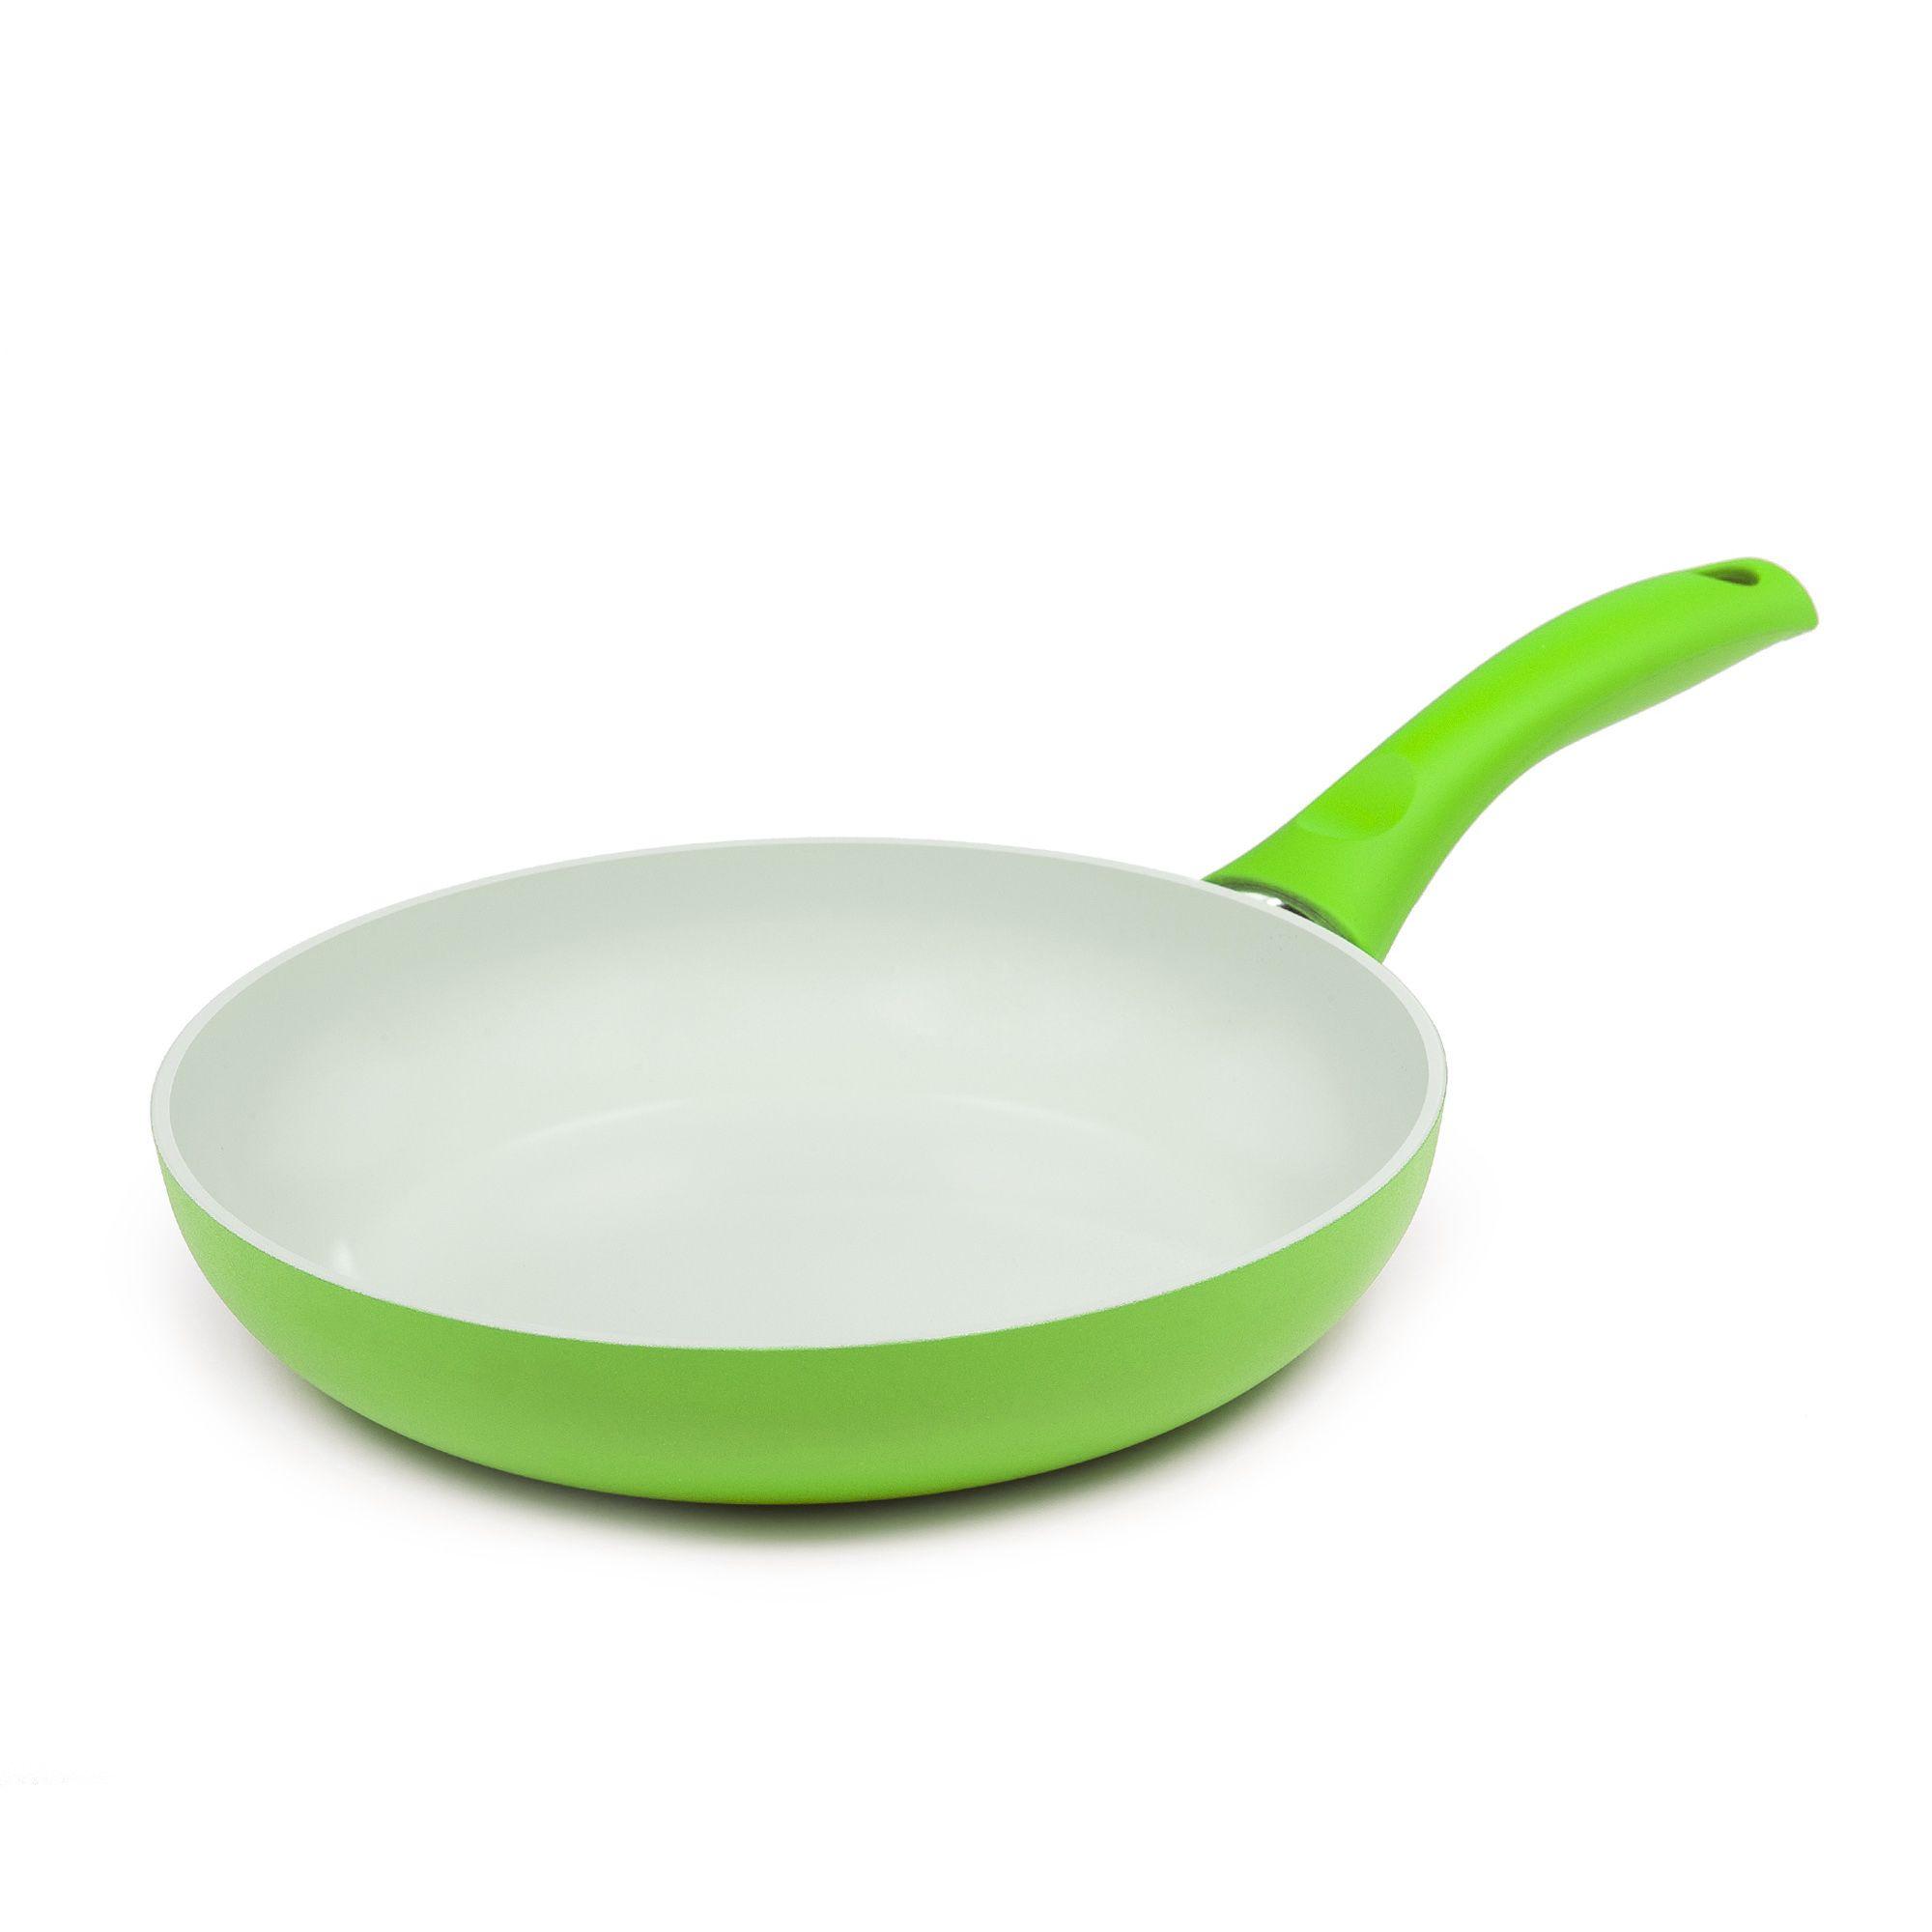 Kuhn rikon cucina marchi qvc italia - Qvc marchi cucina ...